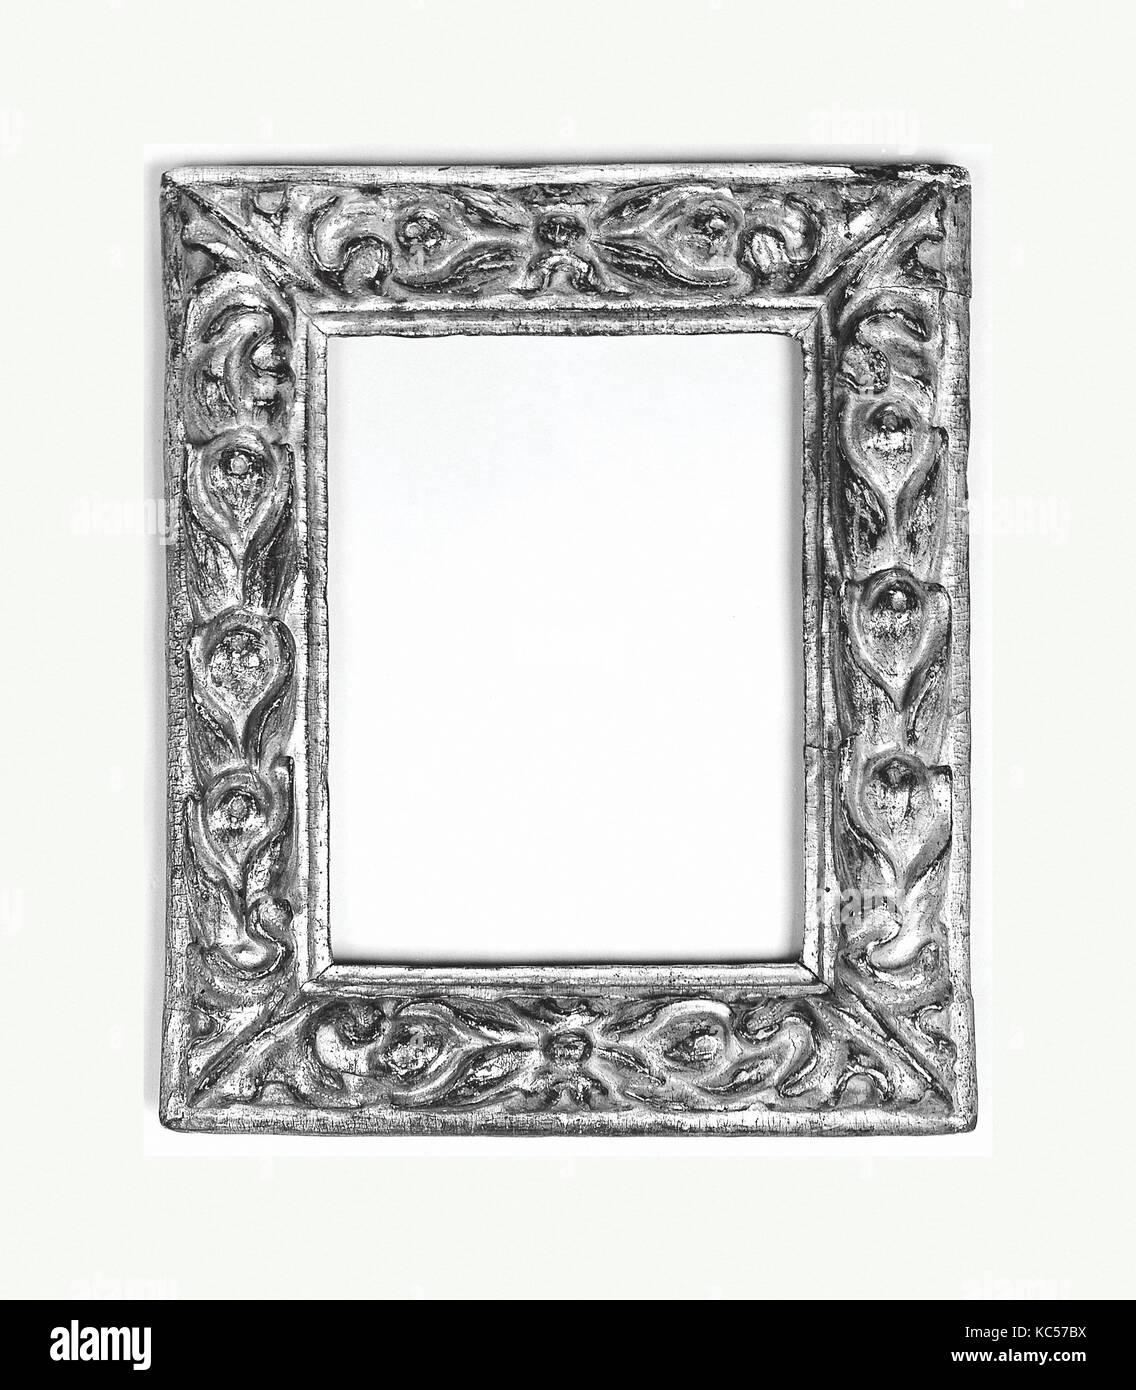 Großzügig 10 X 17 Rahmen Fotos - Benutzerdefinierte Bilderrahmen ...